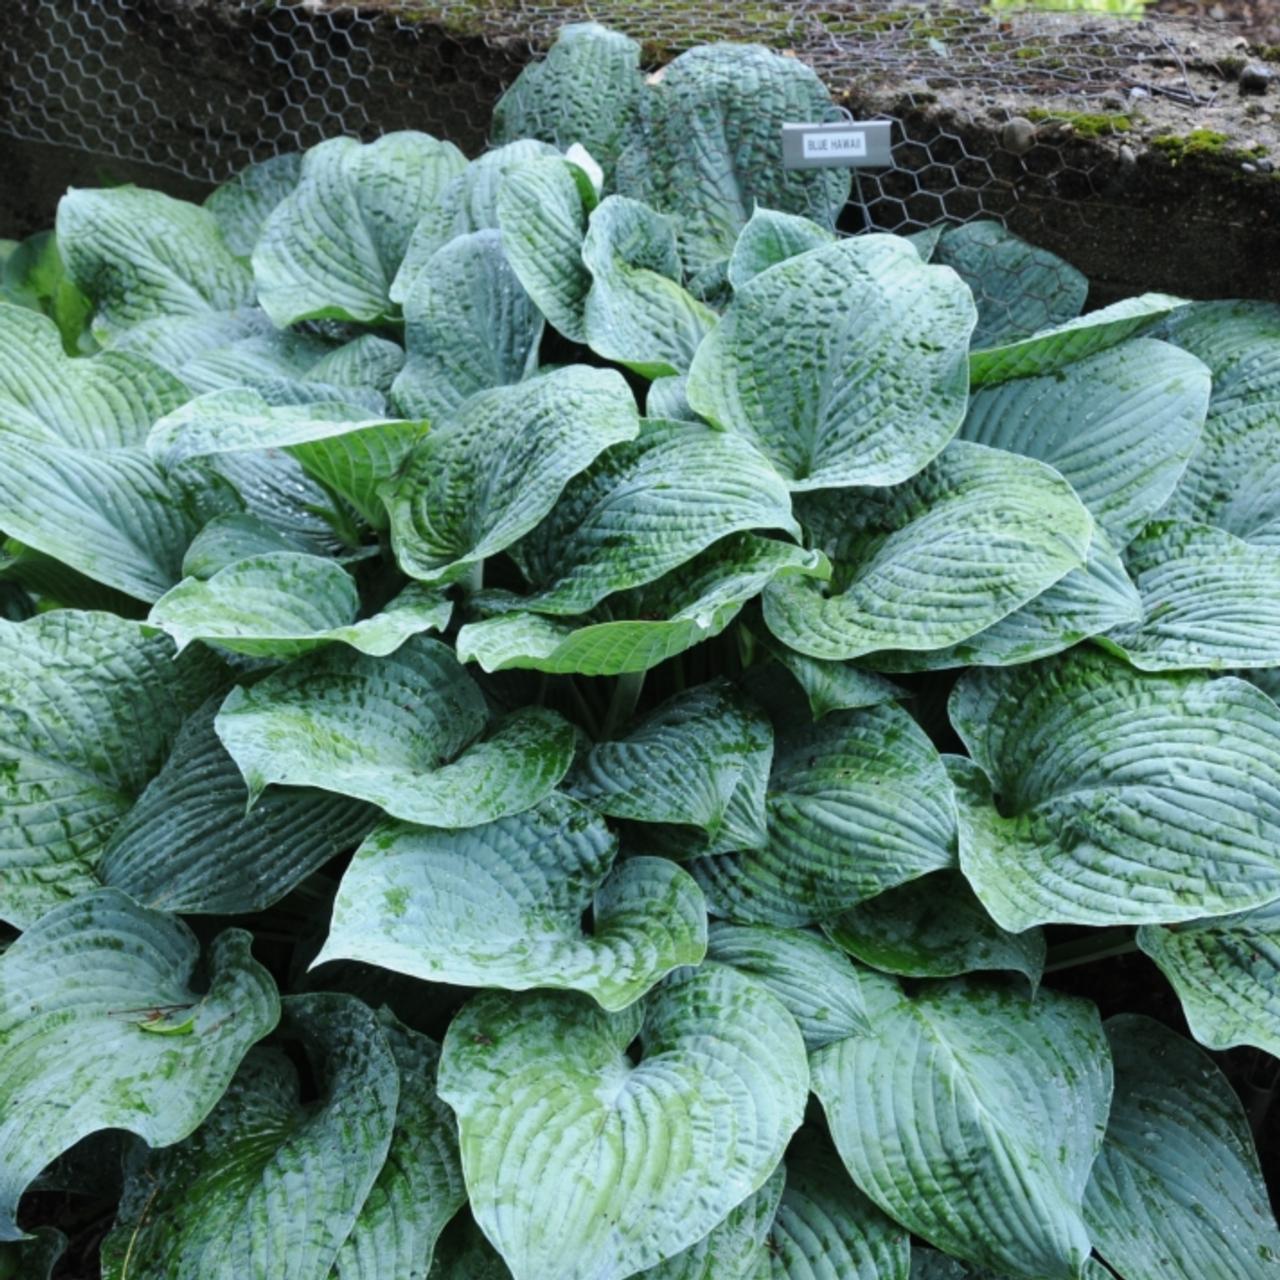 Hosta 'Blue Hawaii' plant